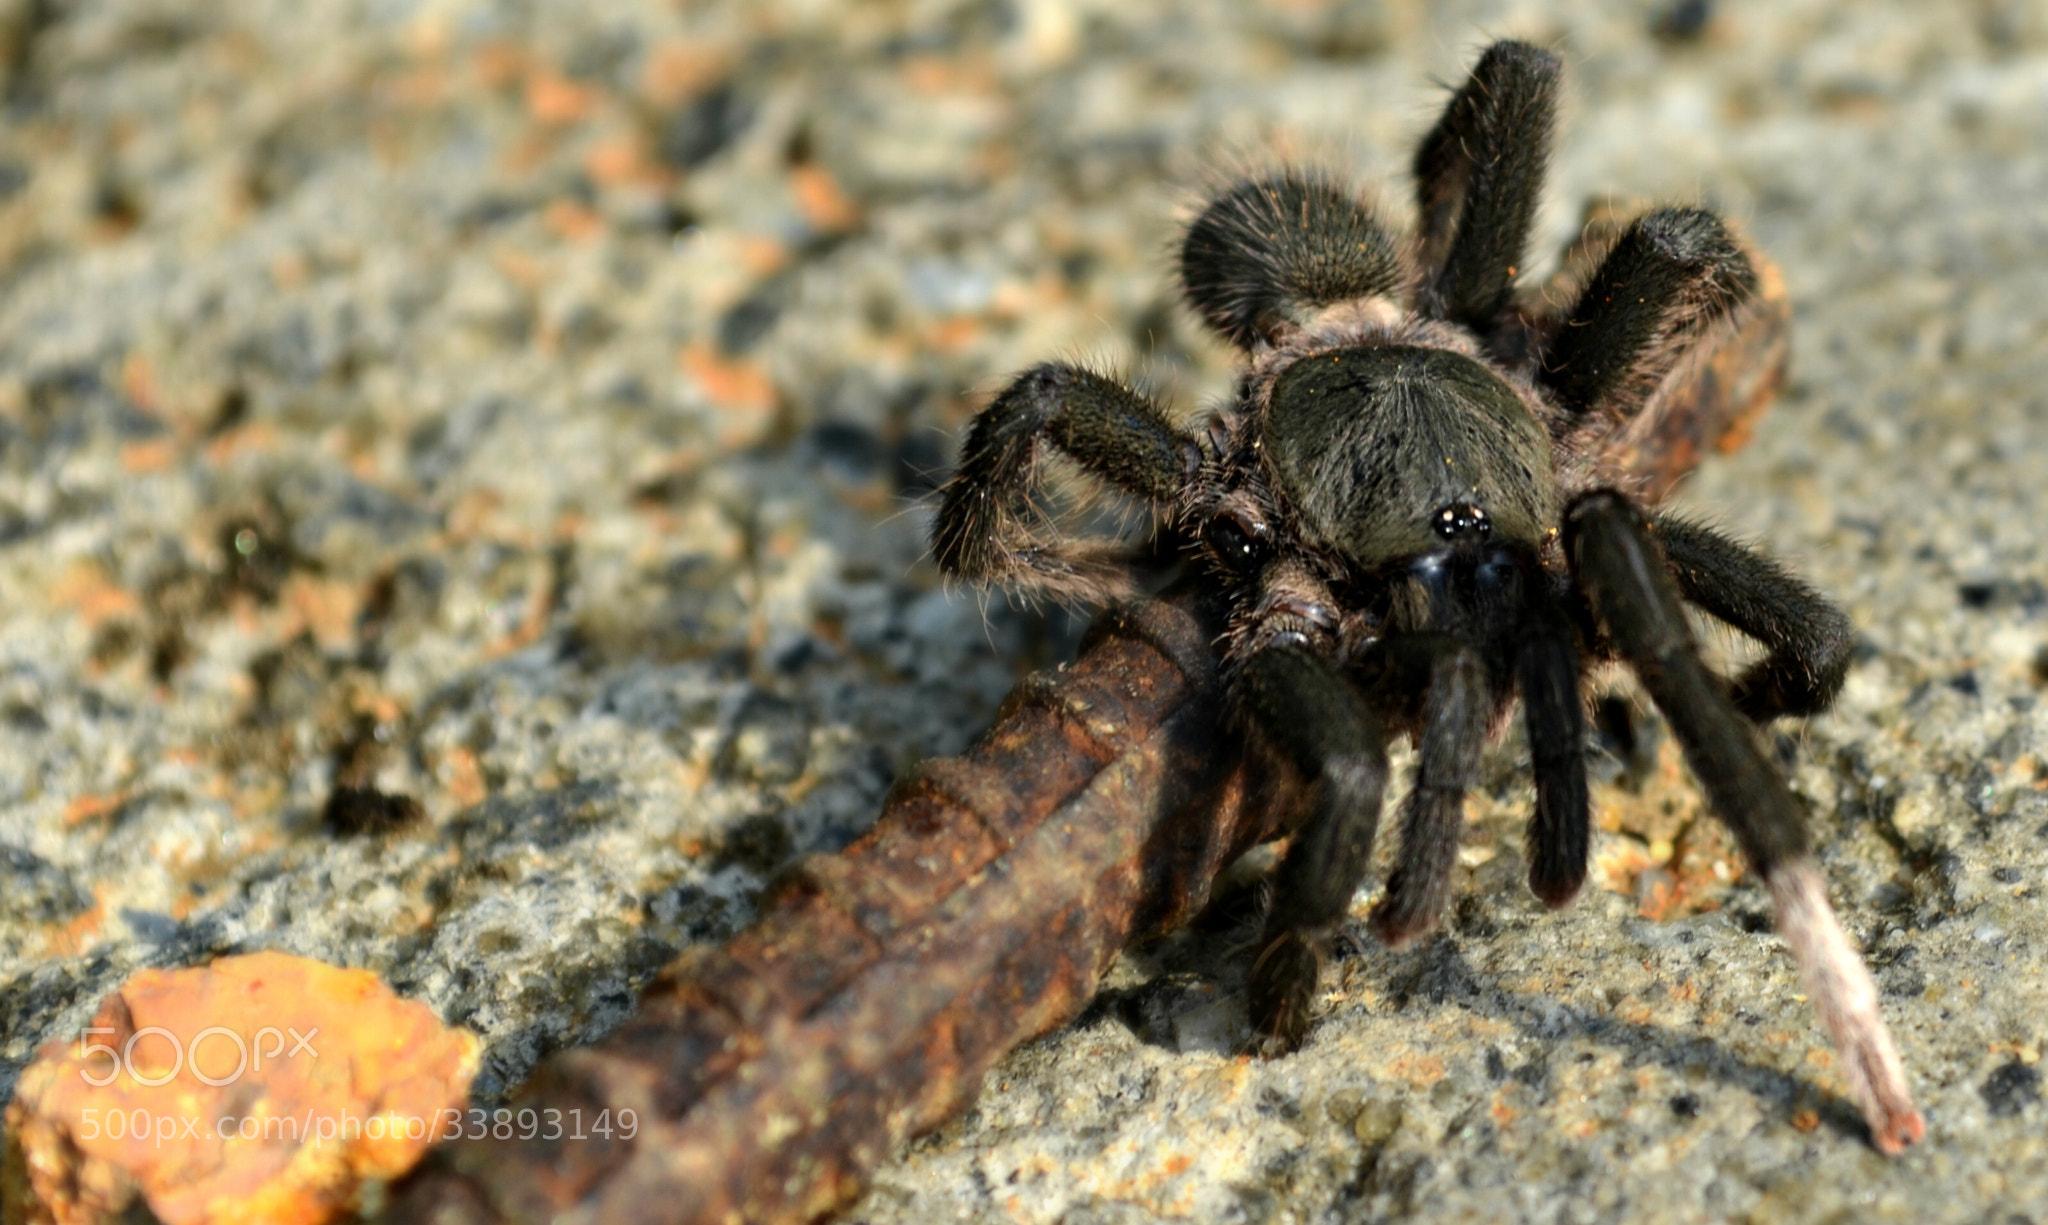 Photograph Arachnophobia... by Krishnendu Sarma on 500px